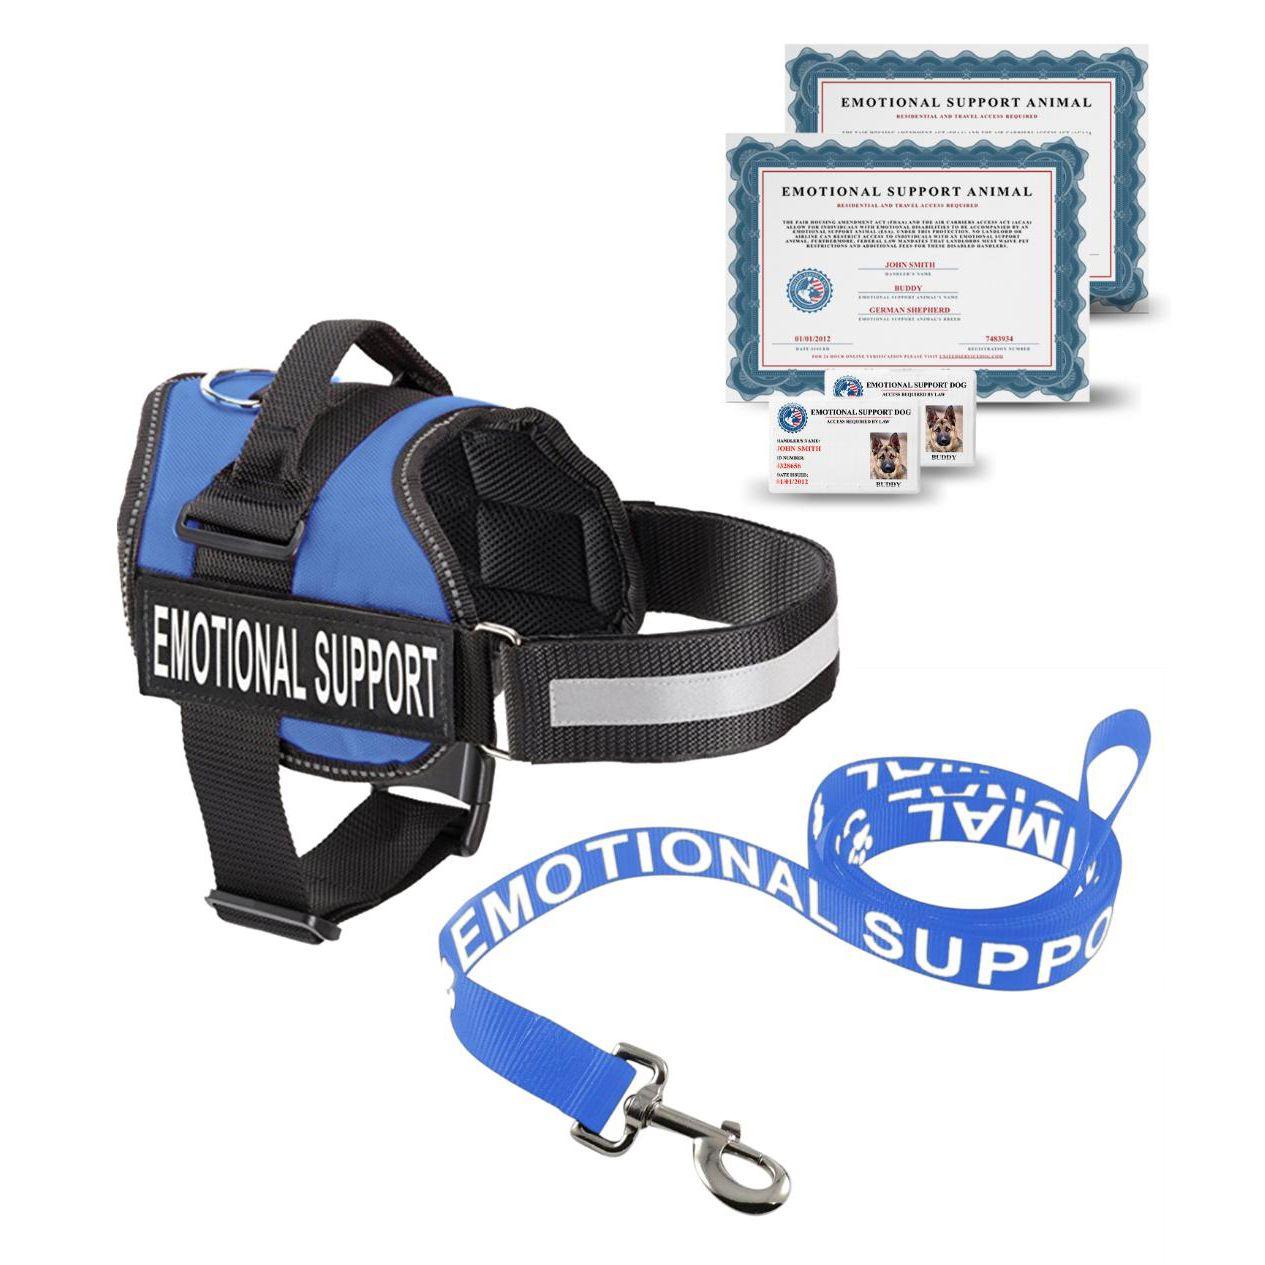 COMPLETE EMOTIONAL SUPPORT ANIMAL KIT Emotional support